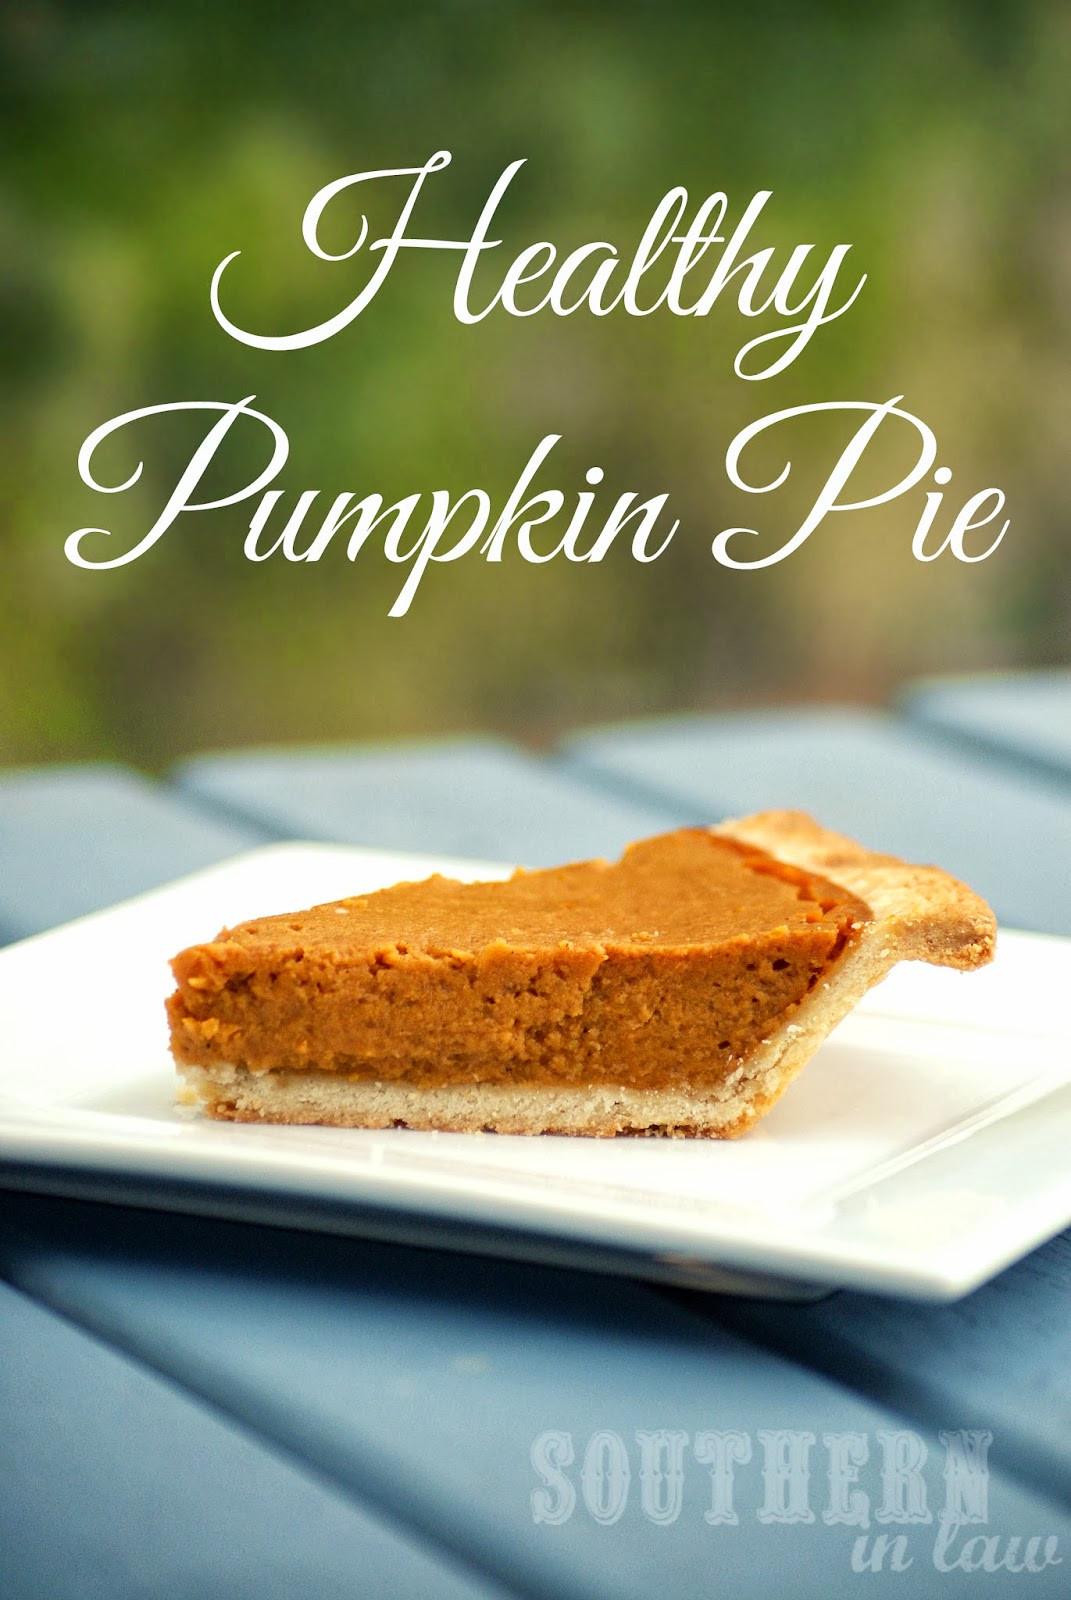 Pumpkin Recipes Healthy  Southern In Law Healthy Pumpkin Pie Recipe